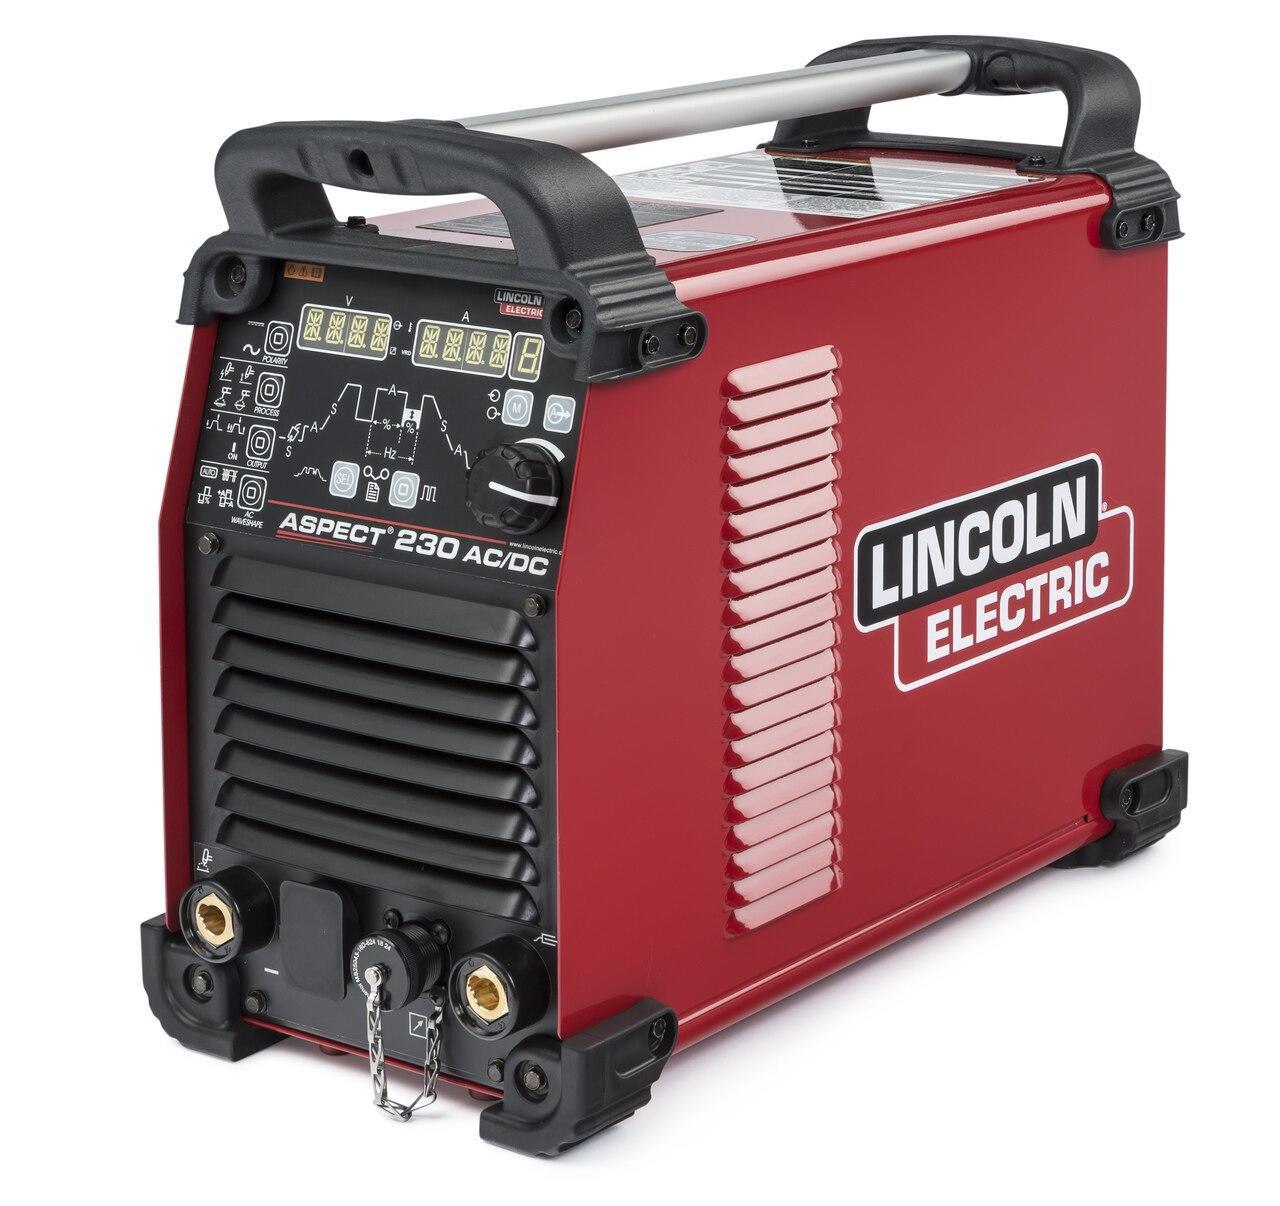 Lincoln Aspect 230 AC/DC TIG Welder K4340-1